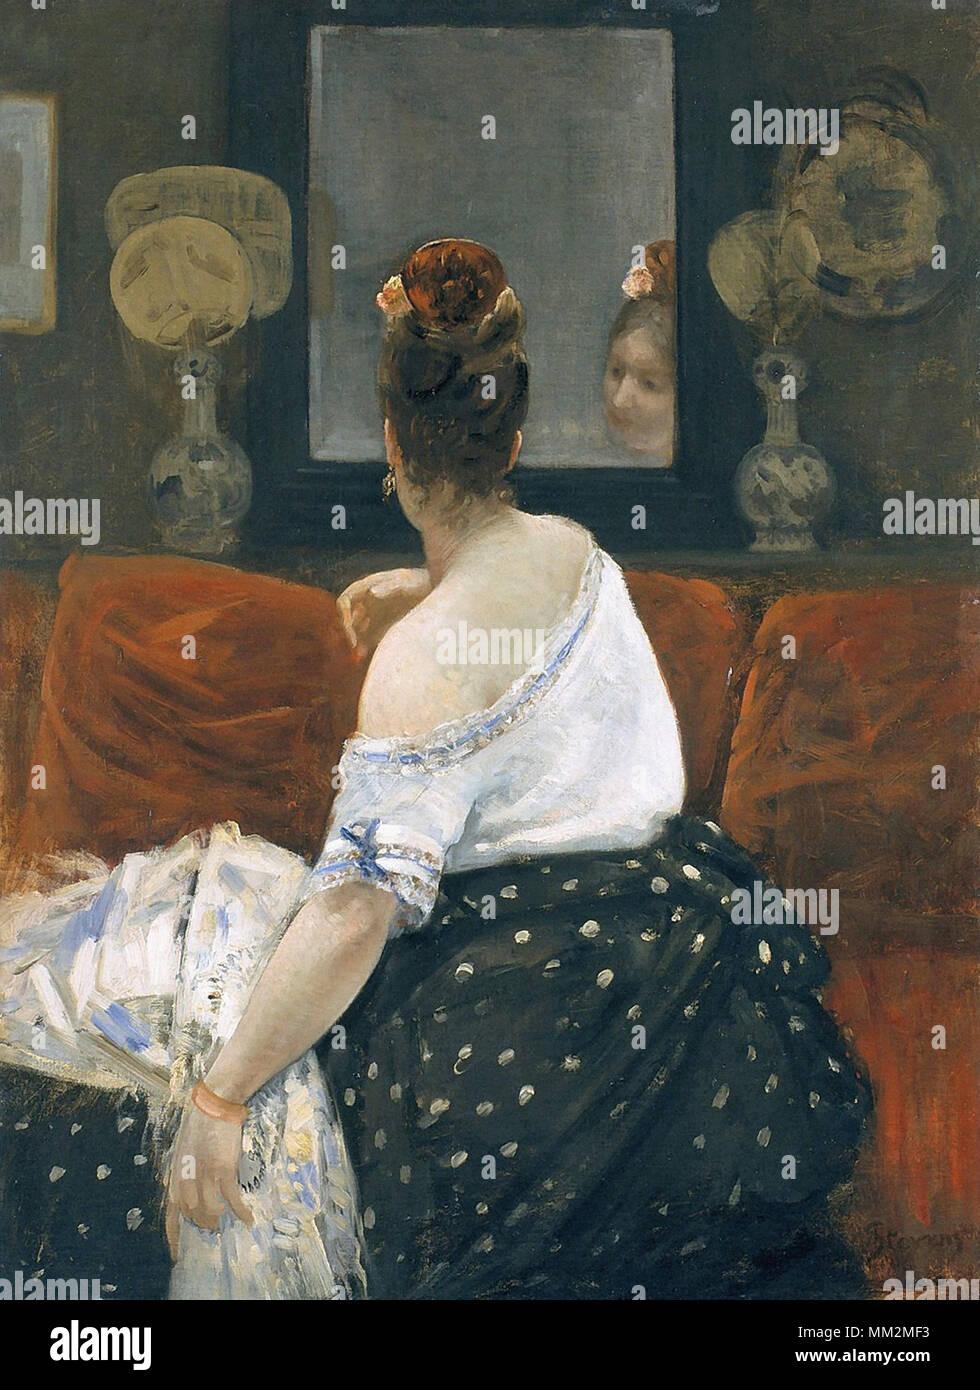 Photo De Femme De Dos : photo, femme, Femme, Resolution, Stock, Photography, Images, Alamy